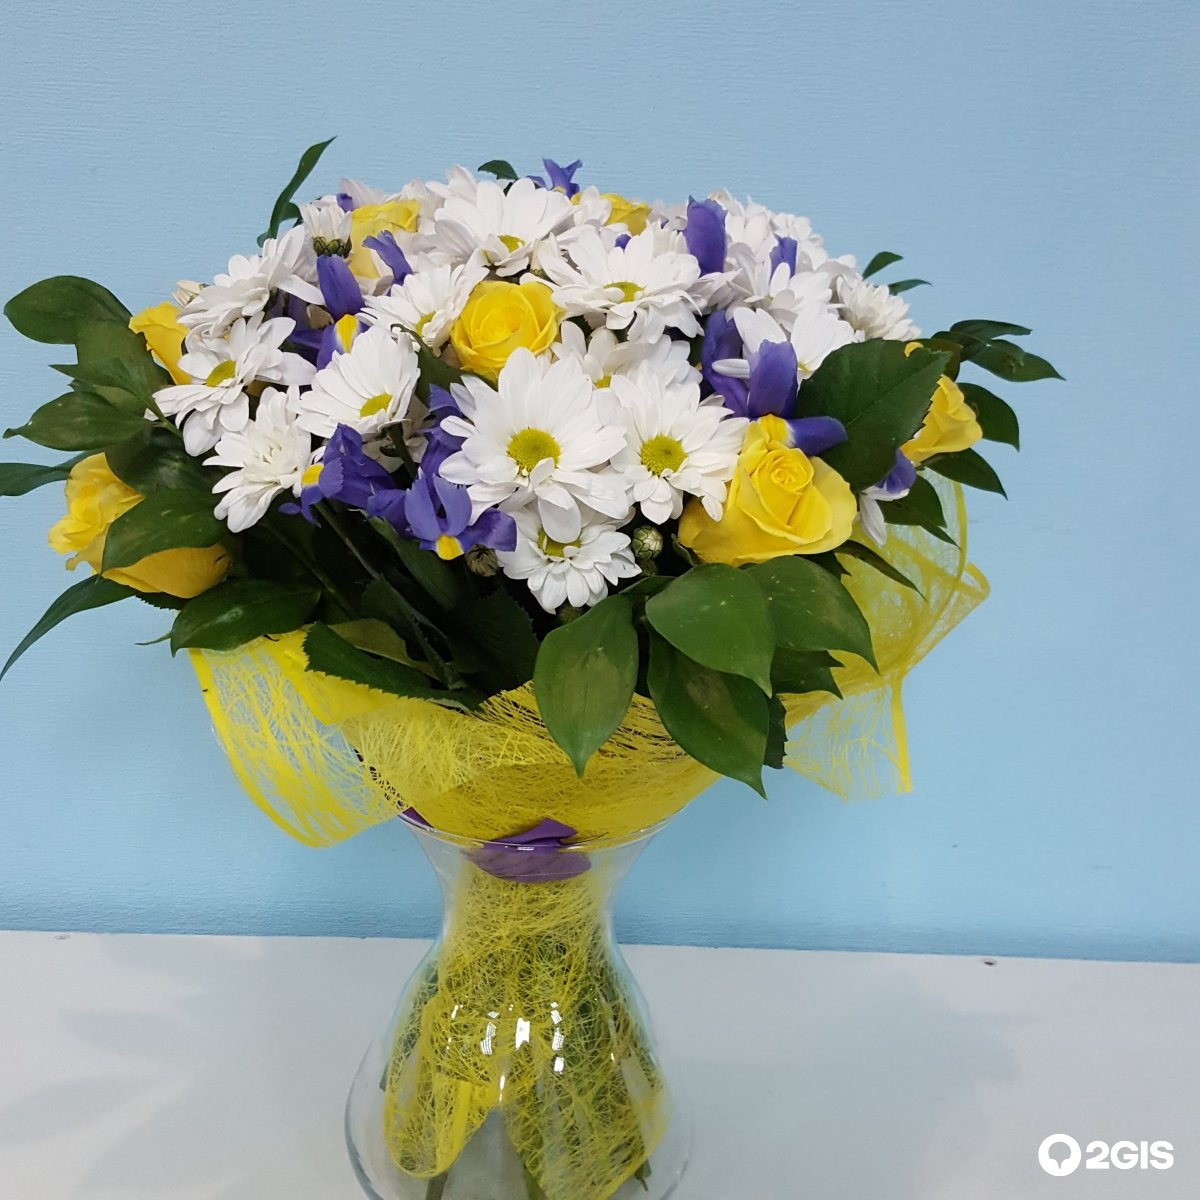 Заказ и доставка цветов в г липецке, цветов пески питер